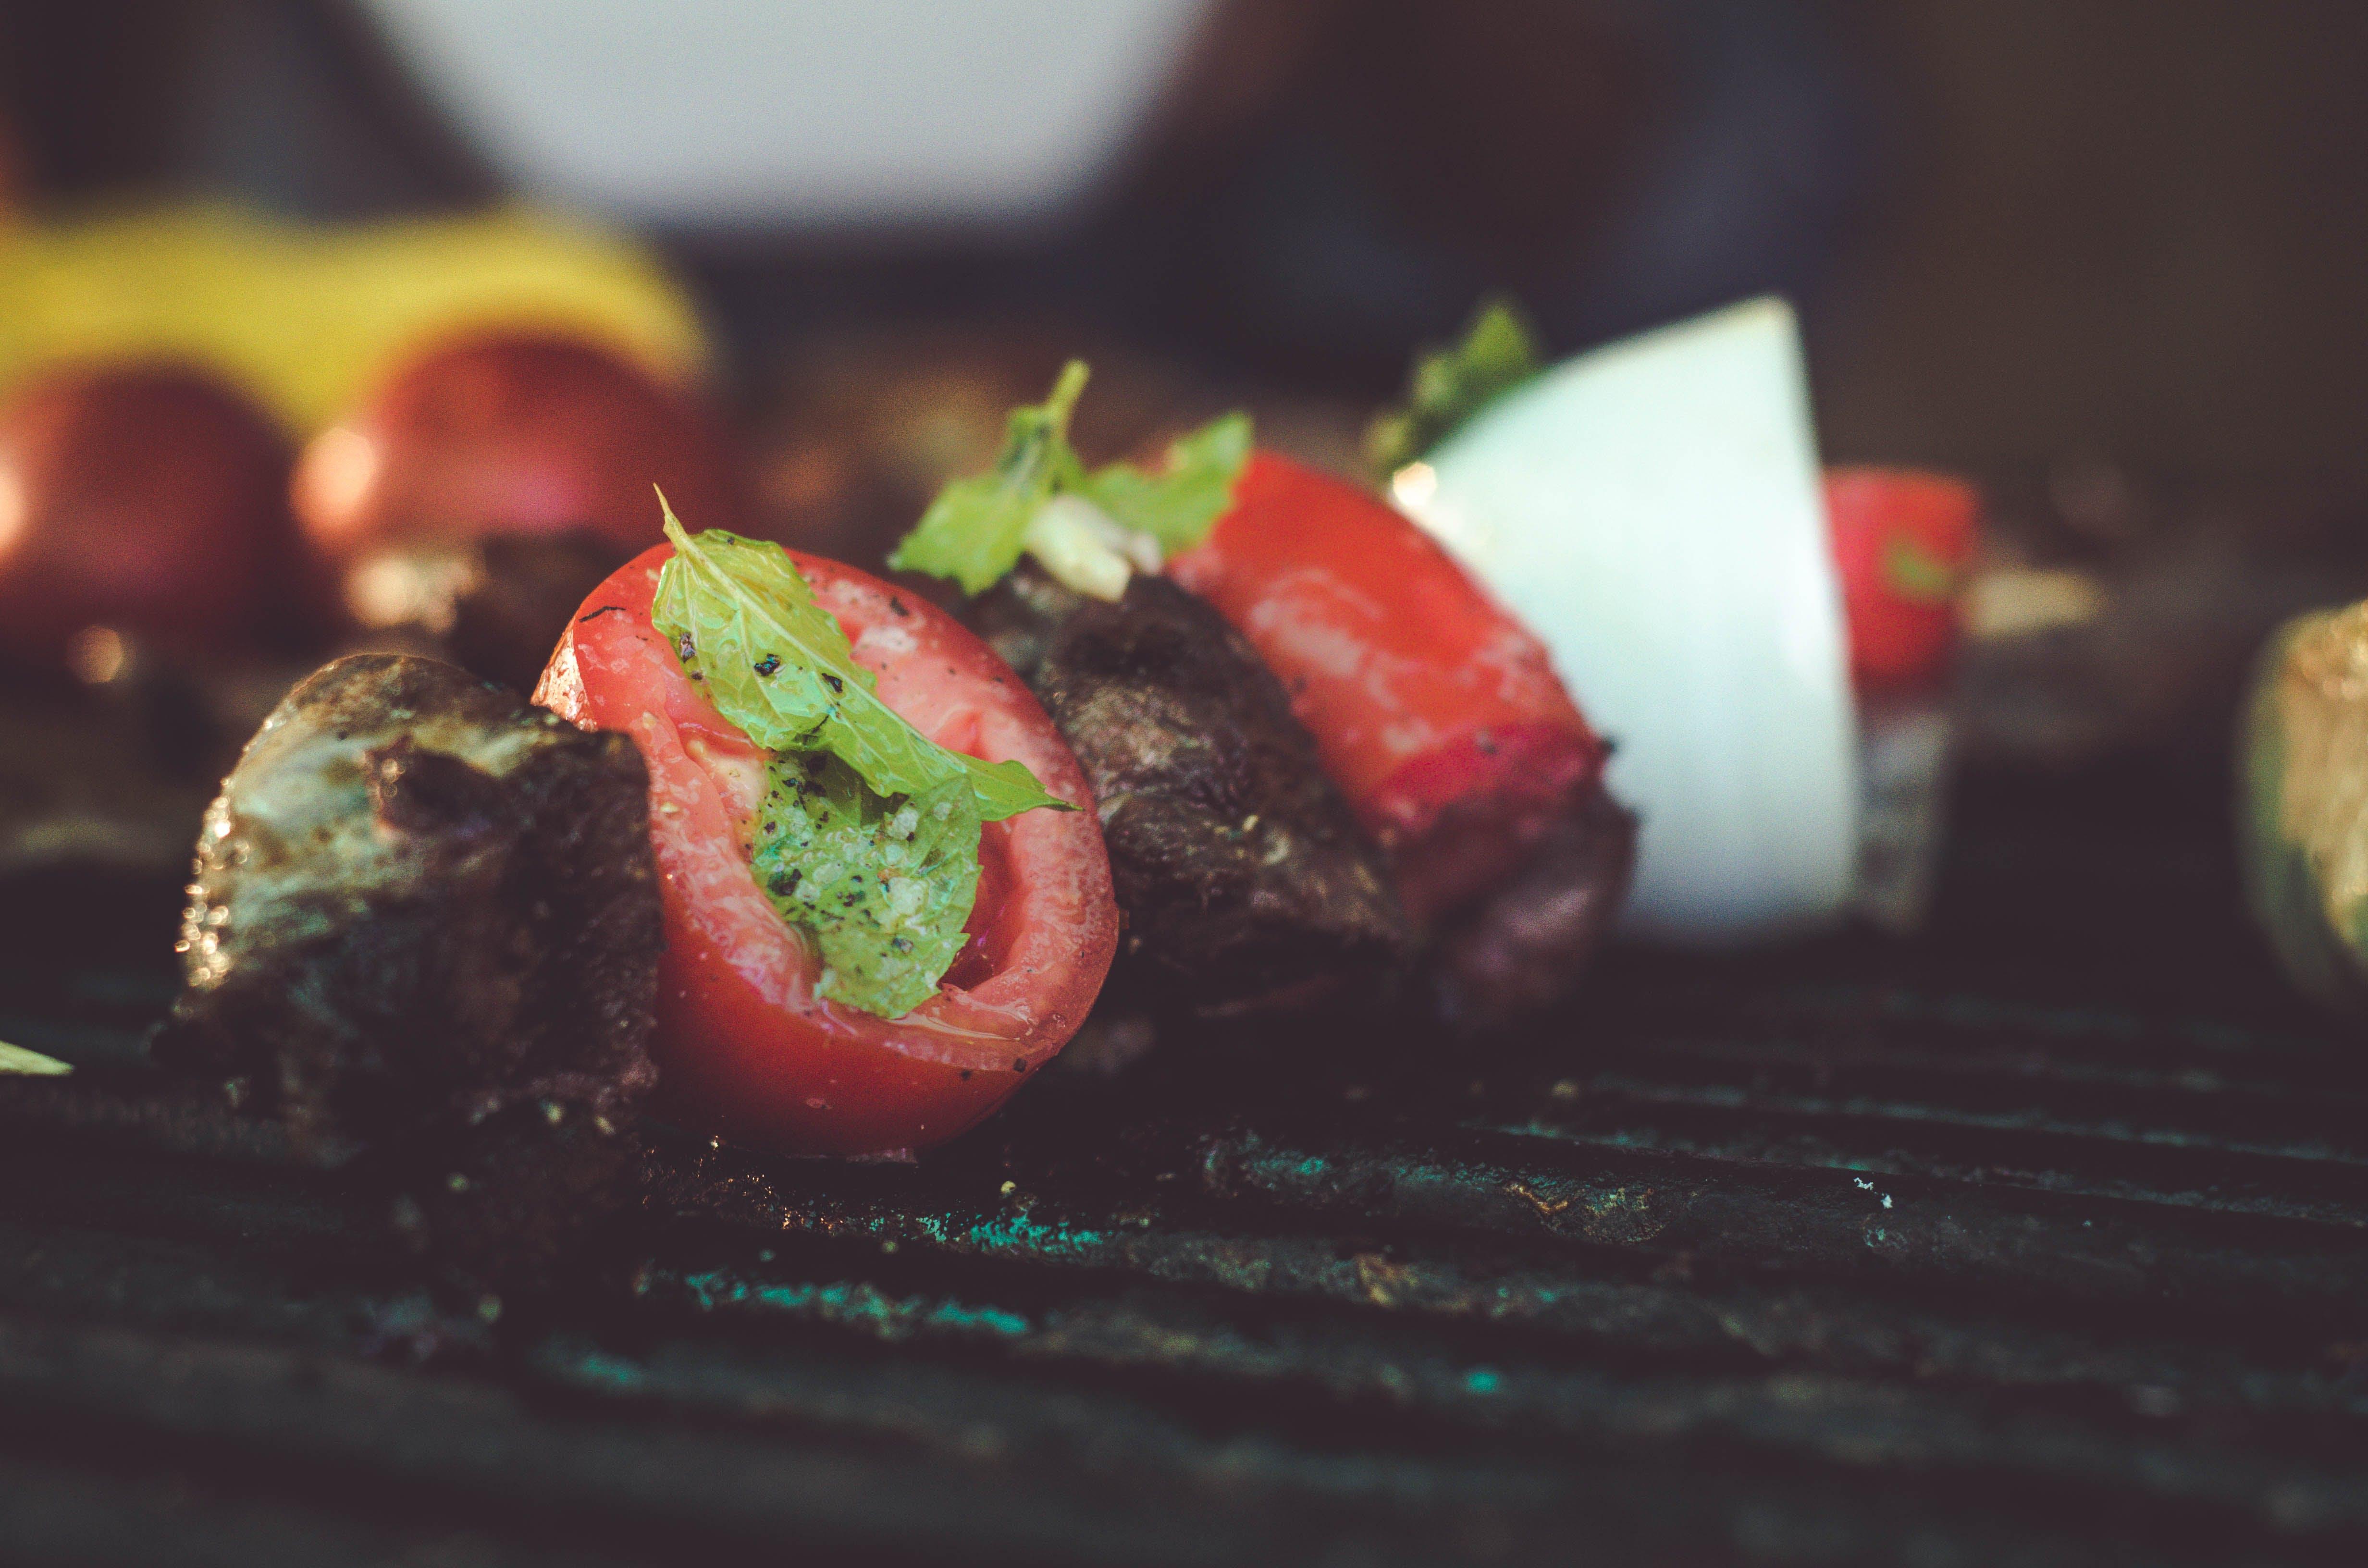 Безкоштовне стокове фото на тему «їжа, баранина, барбекю, великий план»